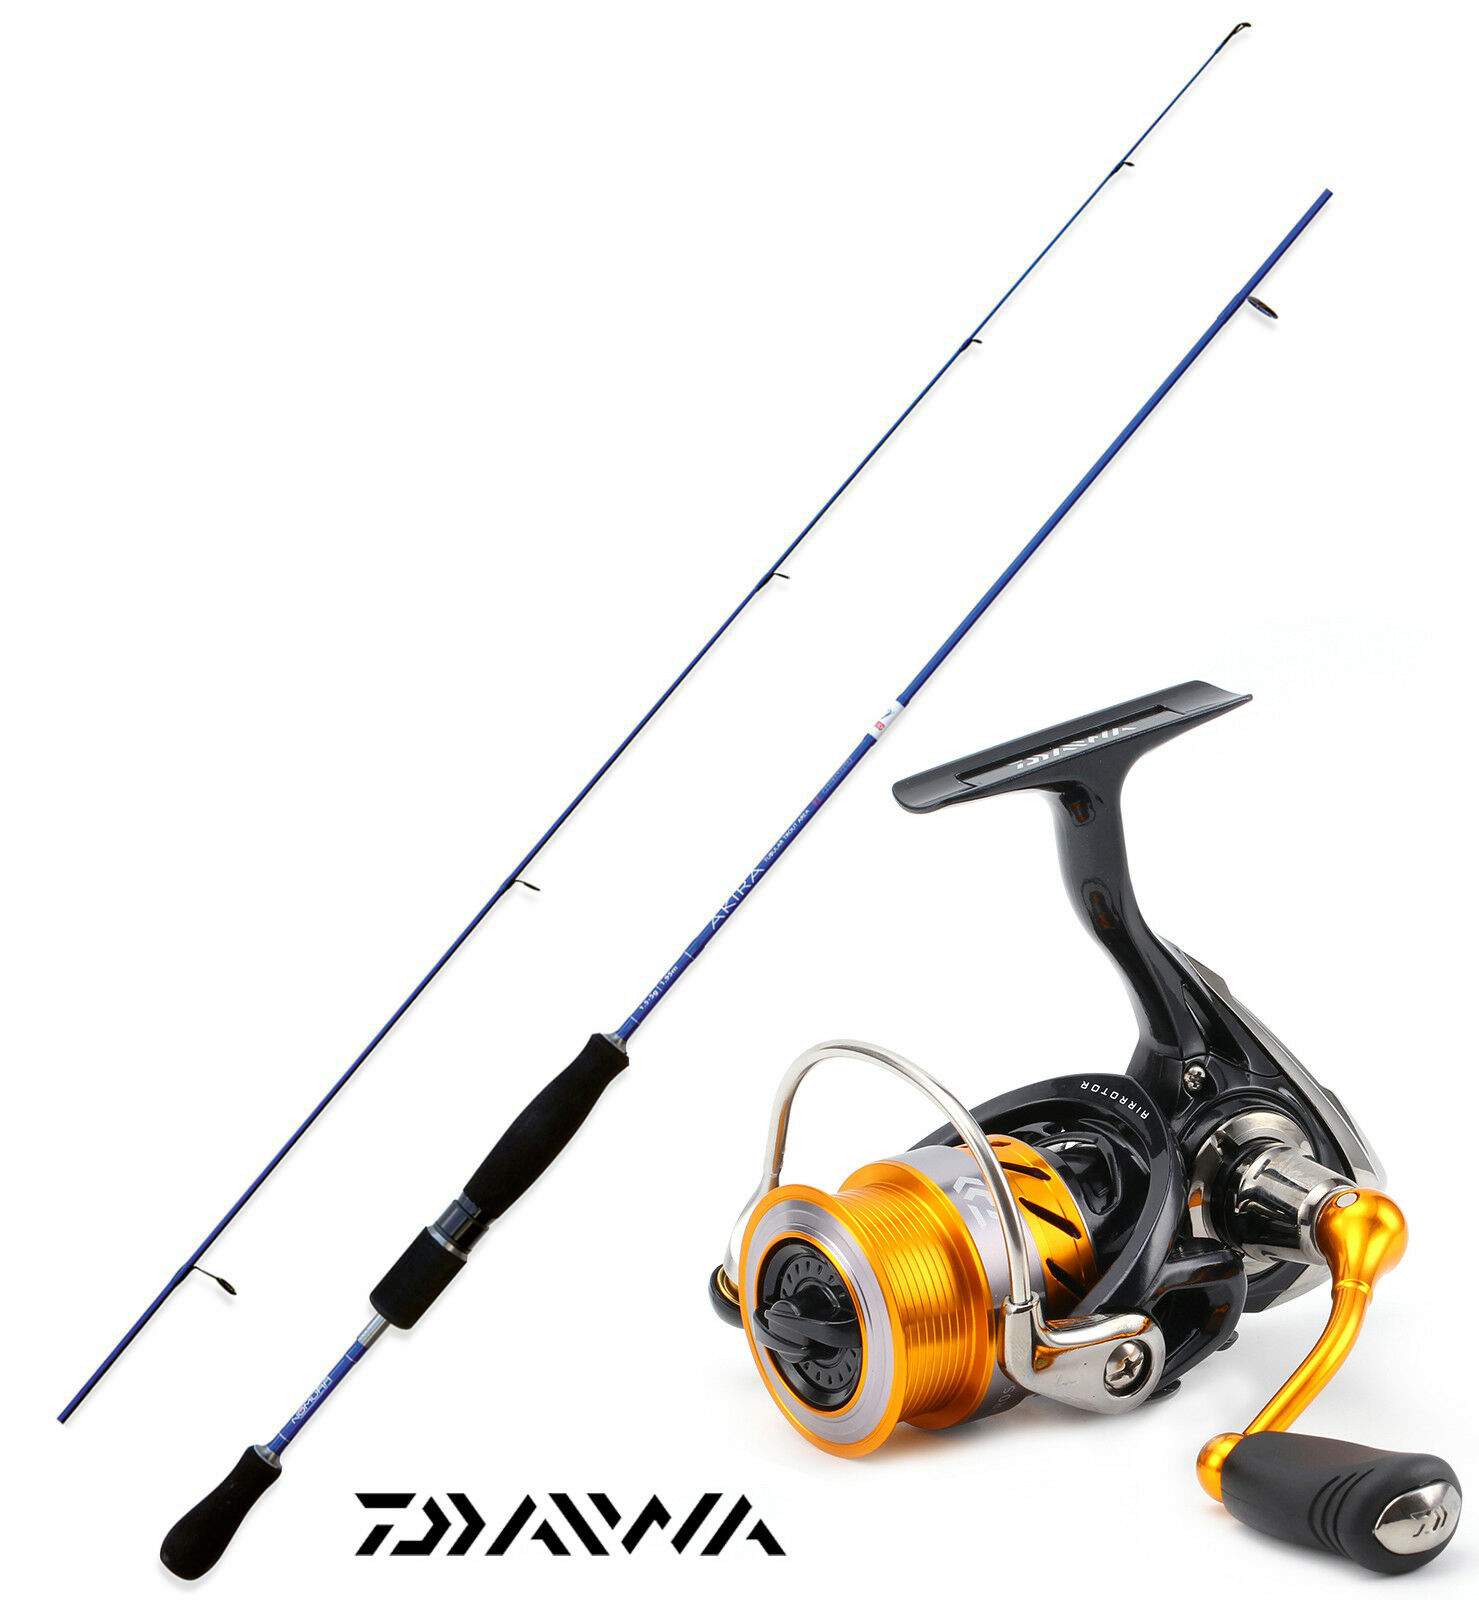 KP3534 Nomura Canna pesca Trout Area Akira tubolar 186 Daiwa Revros 1000 CSP